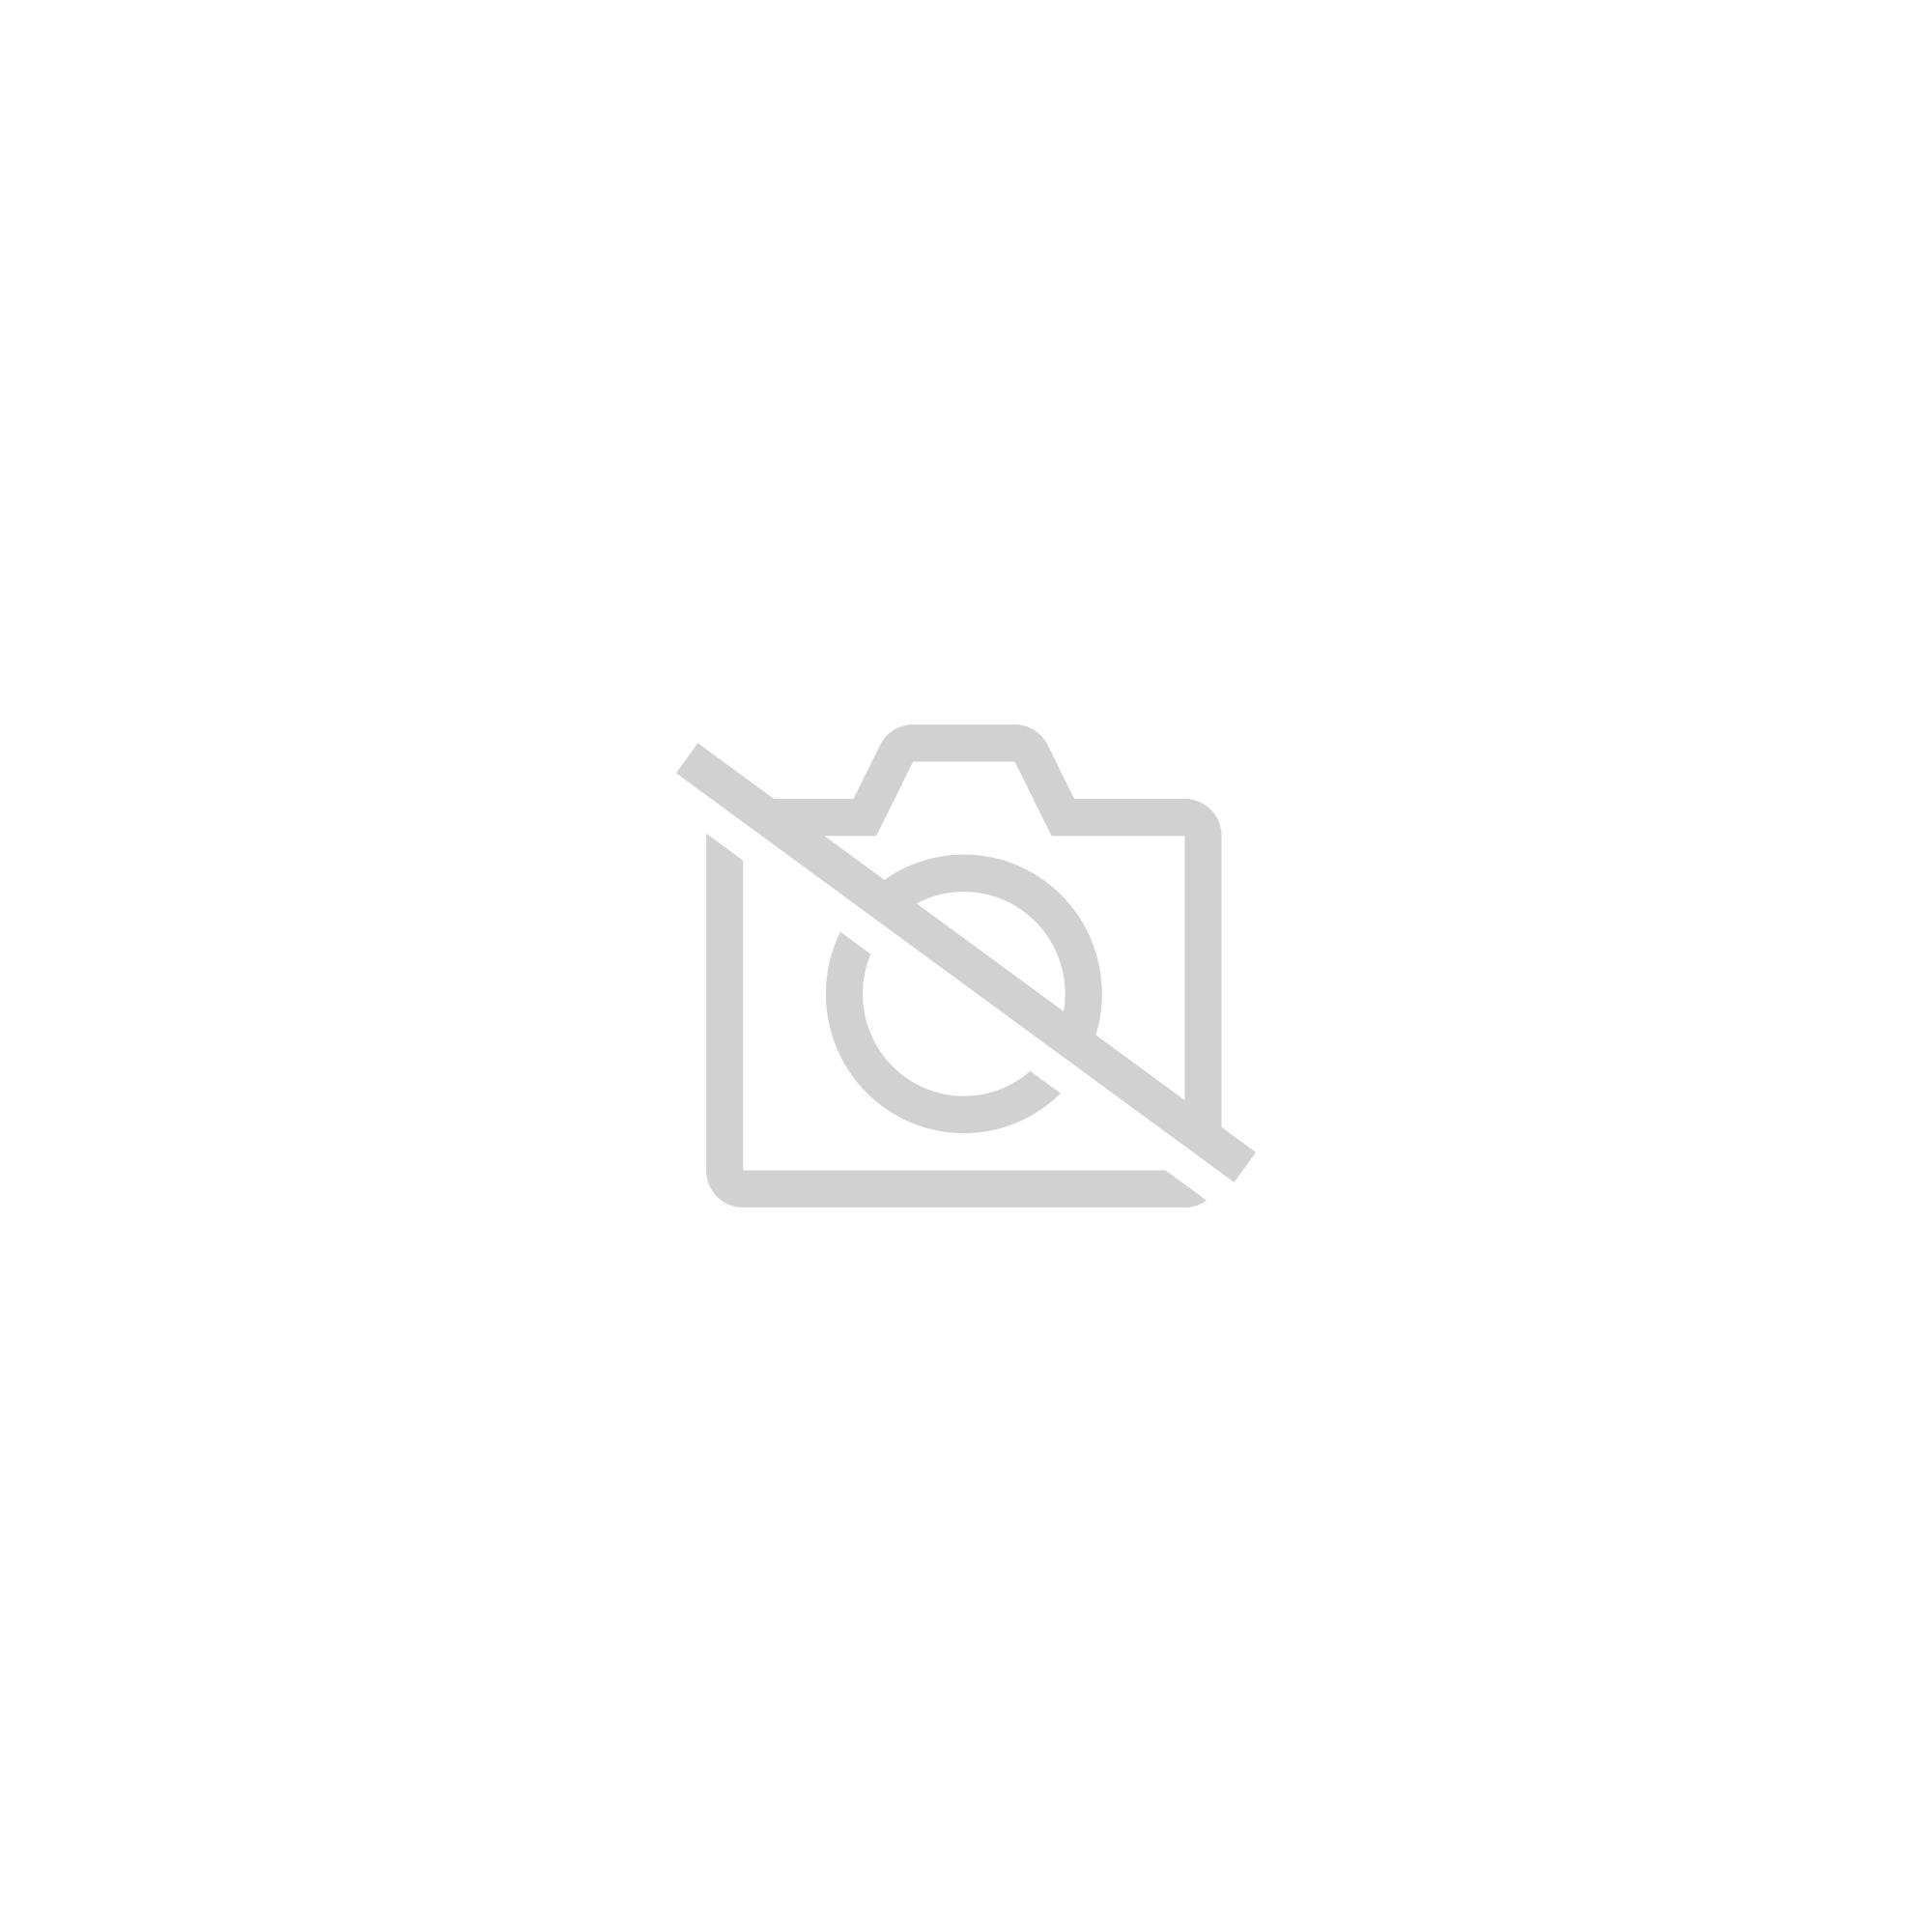 Ontex Id Alese Ontex Id Protea Super Blanc 180 X 90 Cm